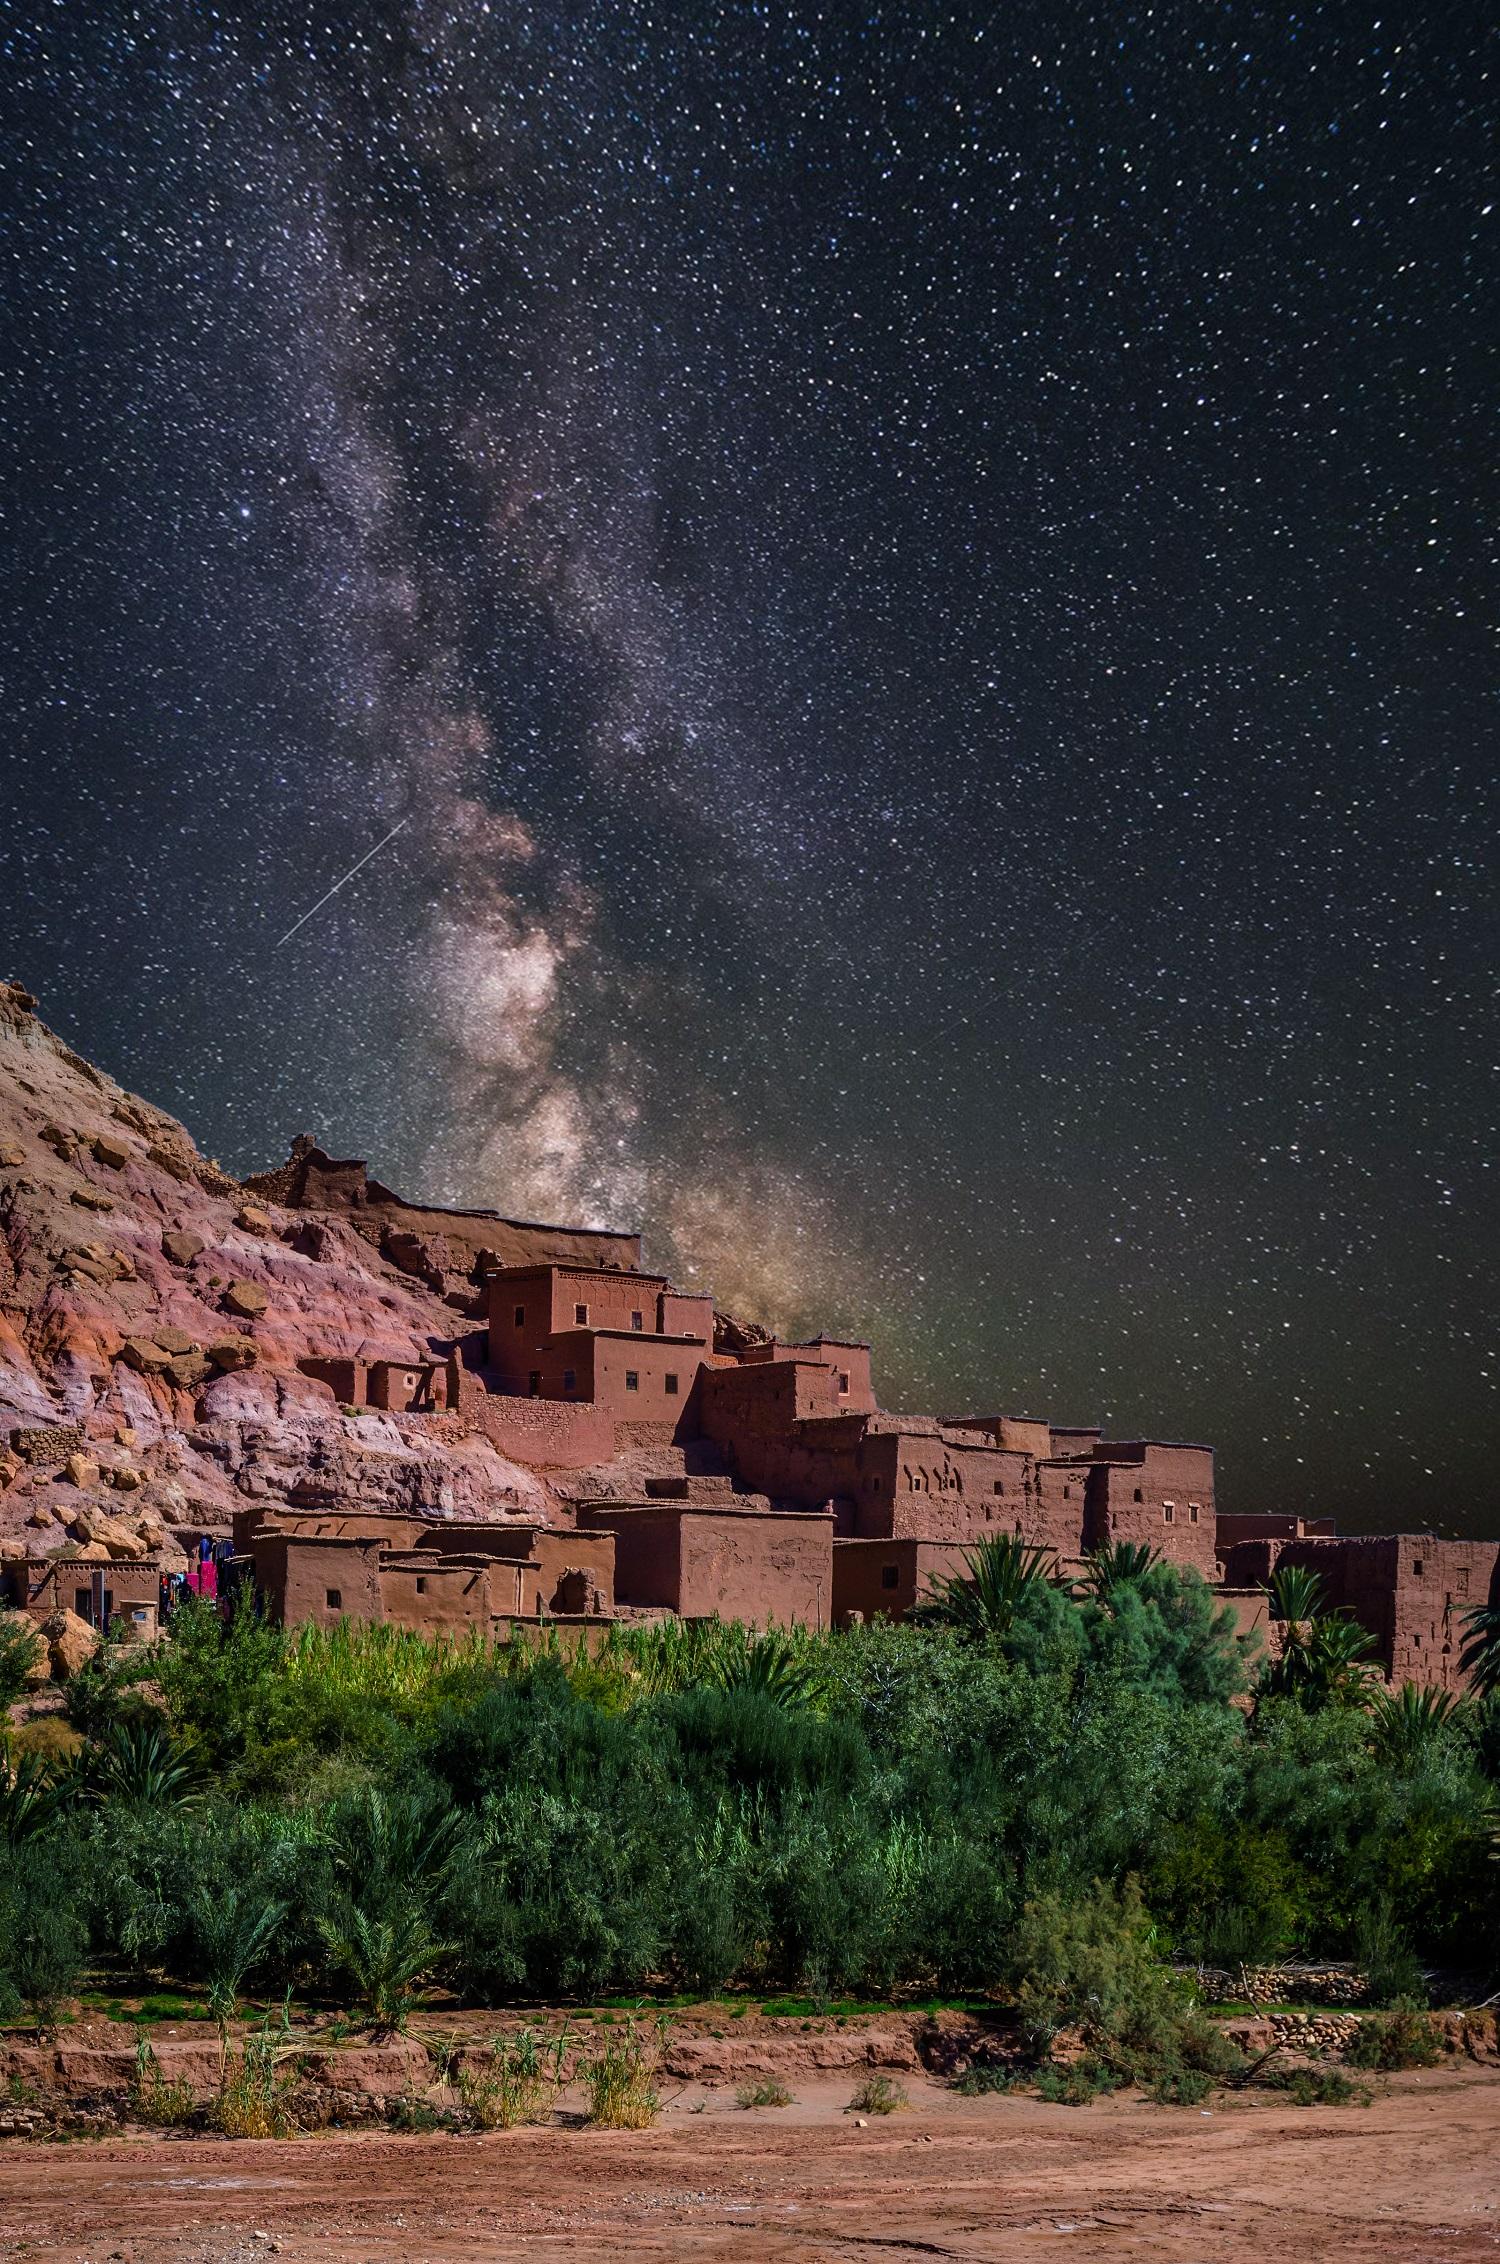 kasbah ait ben haddou desert morocco stars